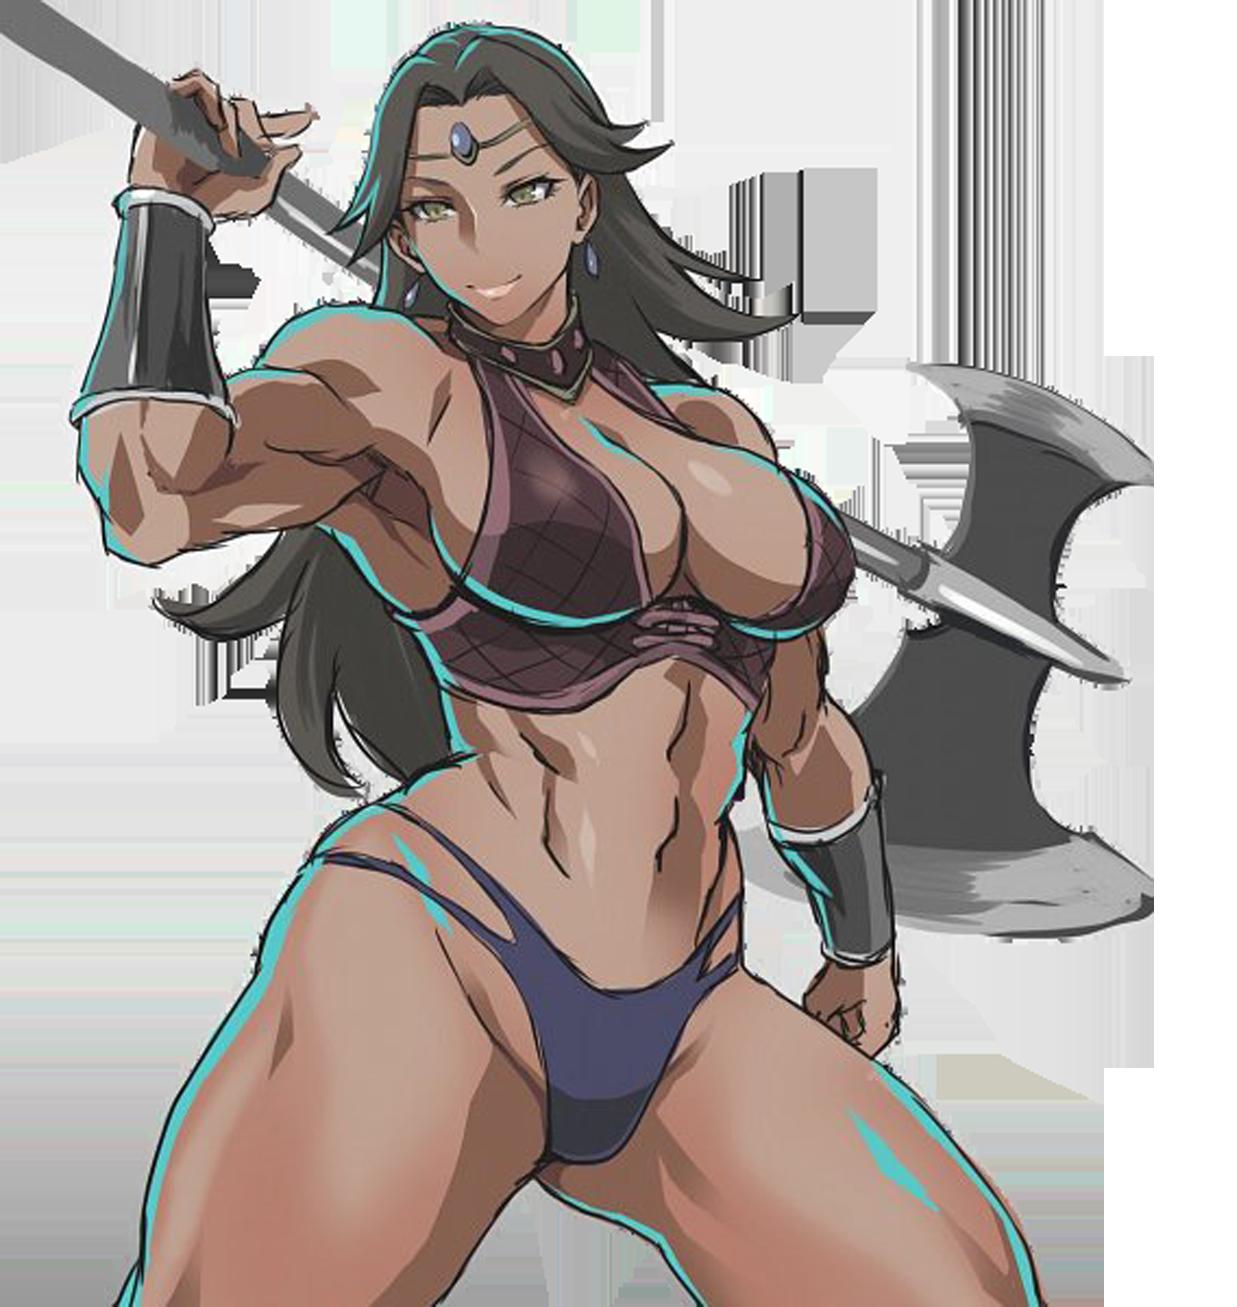 Amazon Warrior (The Stranded Barbarian)